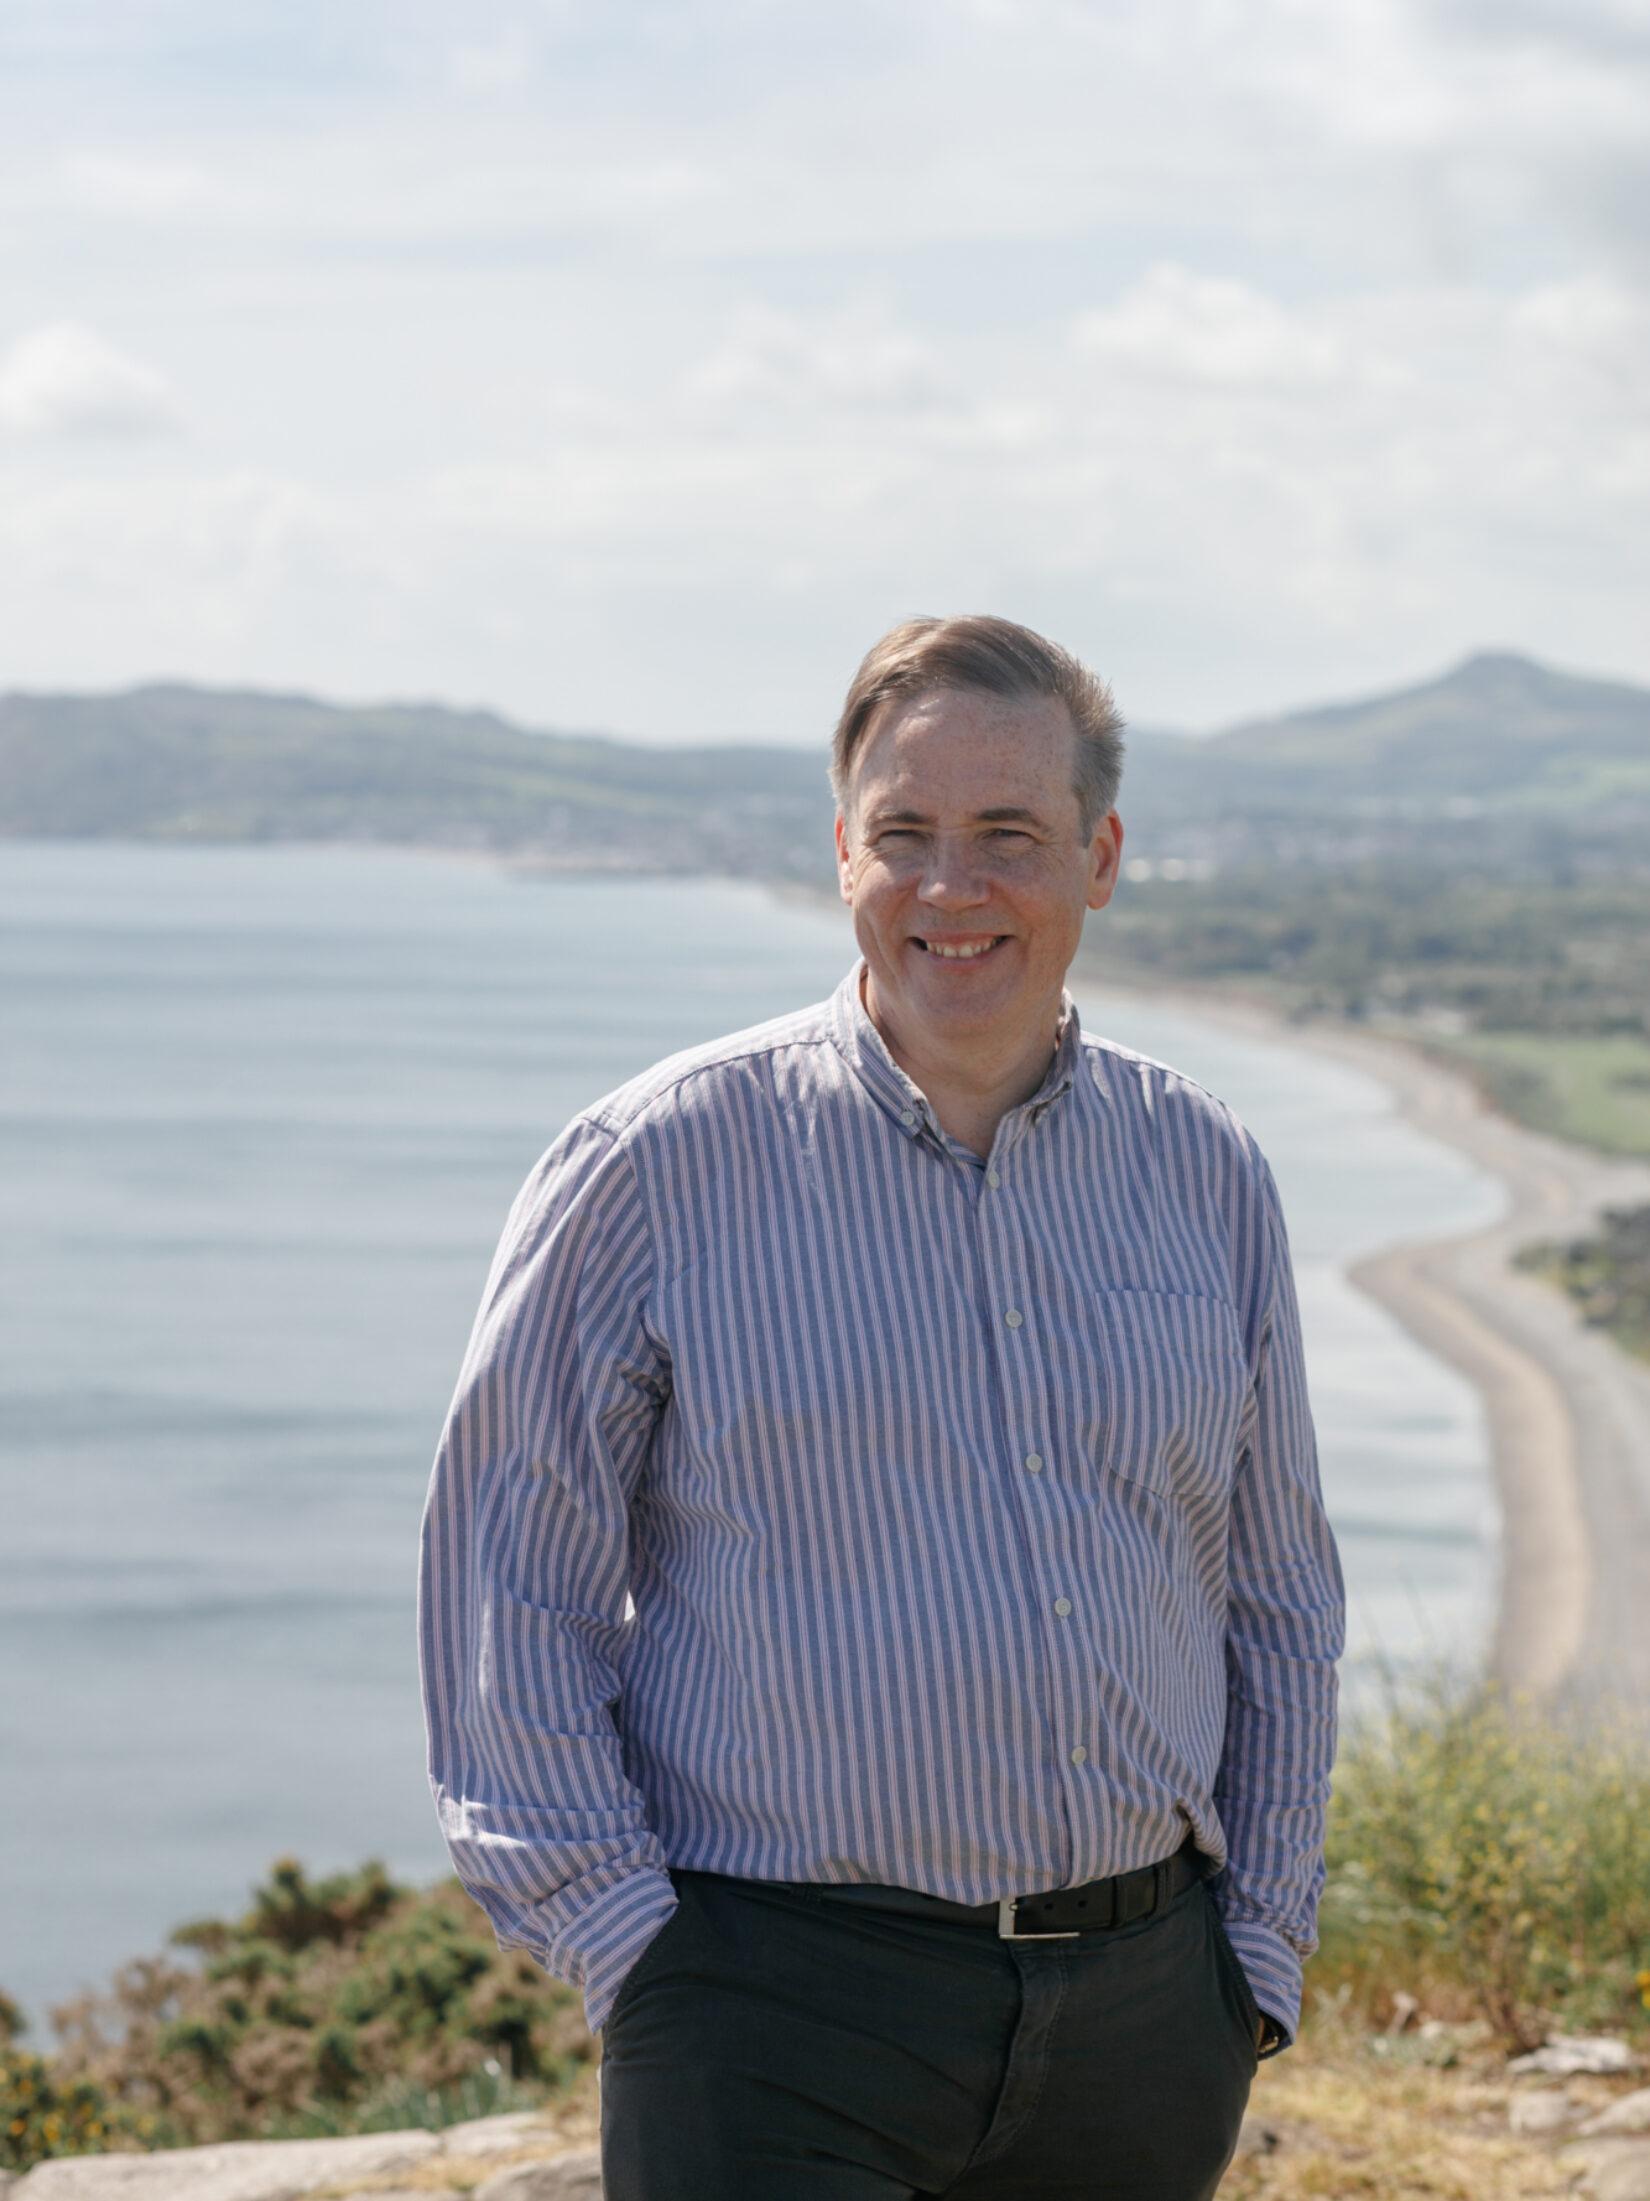 Portrait image of Shane O'Mara, photographed overlooking a beach